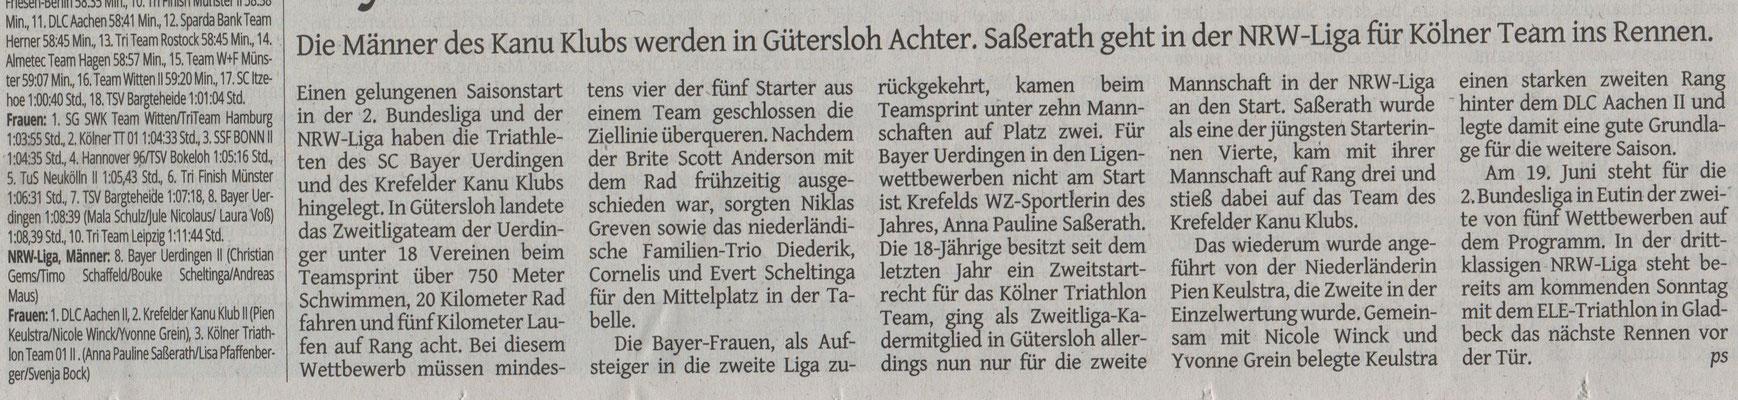 Westdeutsche Zeitung 25.05.2016